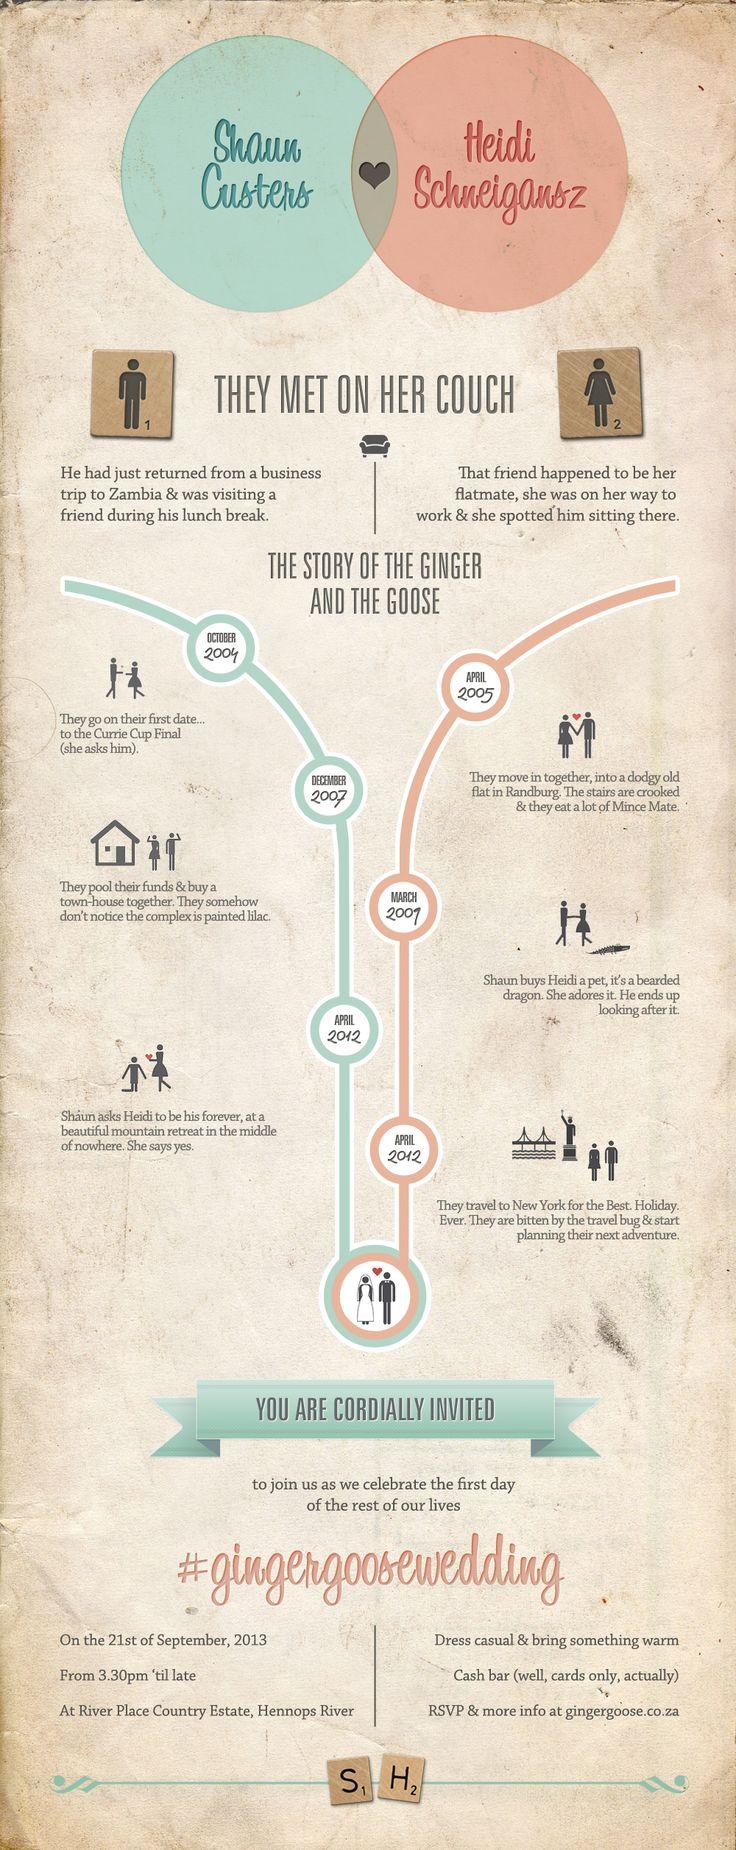 Wedding invitation infographic #gingergoosewedding #scrabble #infographic